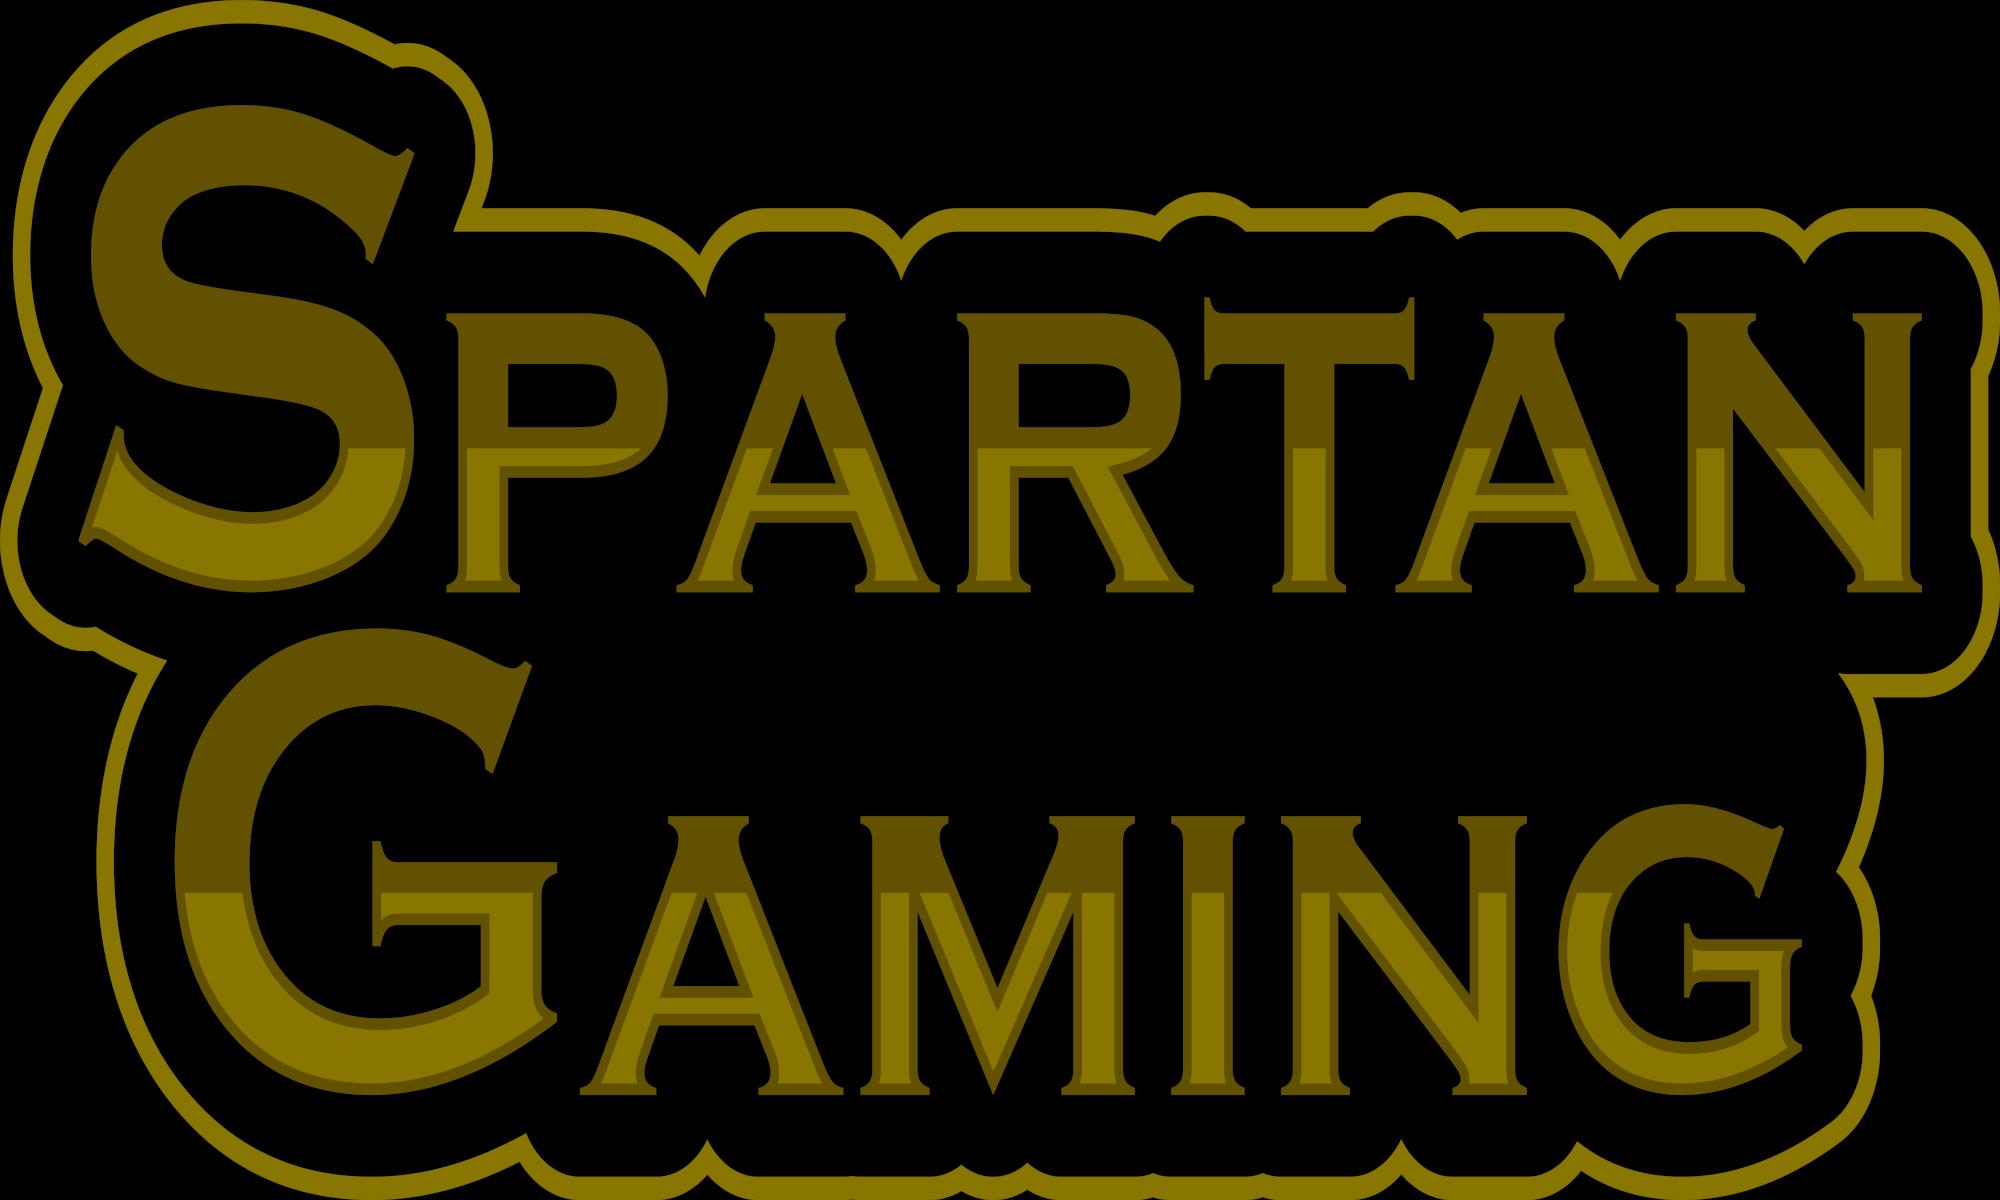 Spartan Gaming